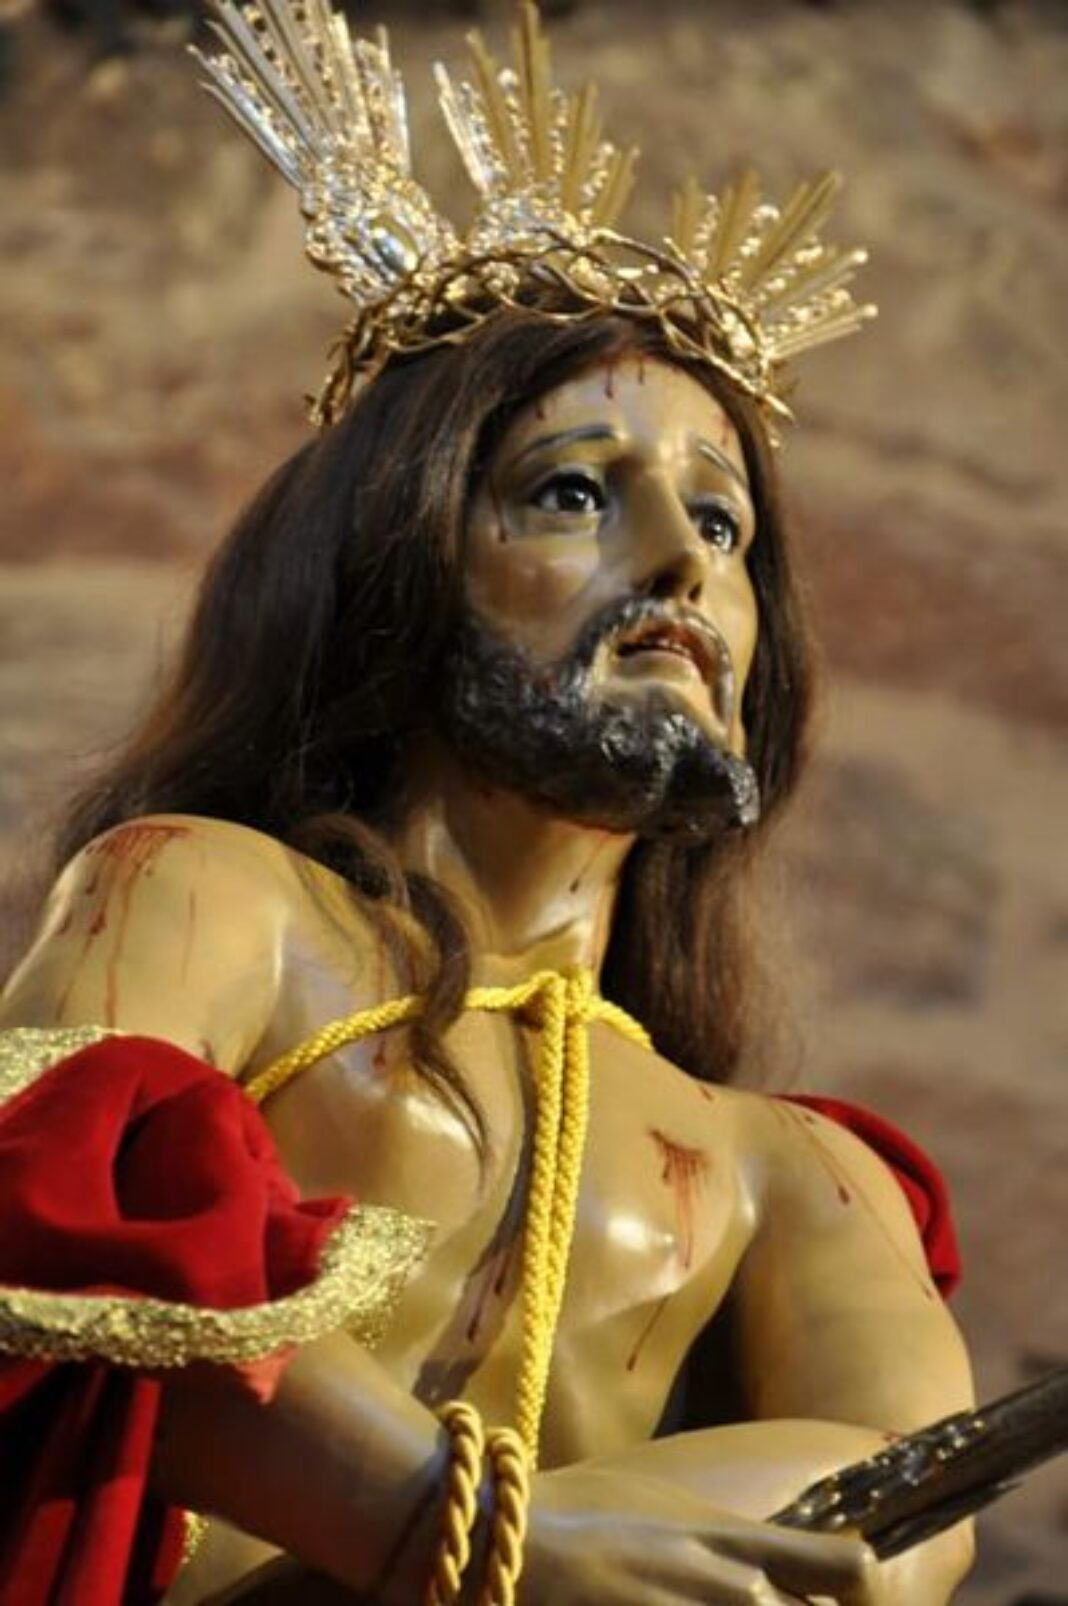 Cristo de la Misericordia 1068x1606 - Festividad del Santísimo Cristo de la Misericordia